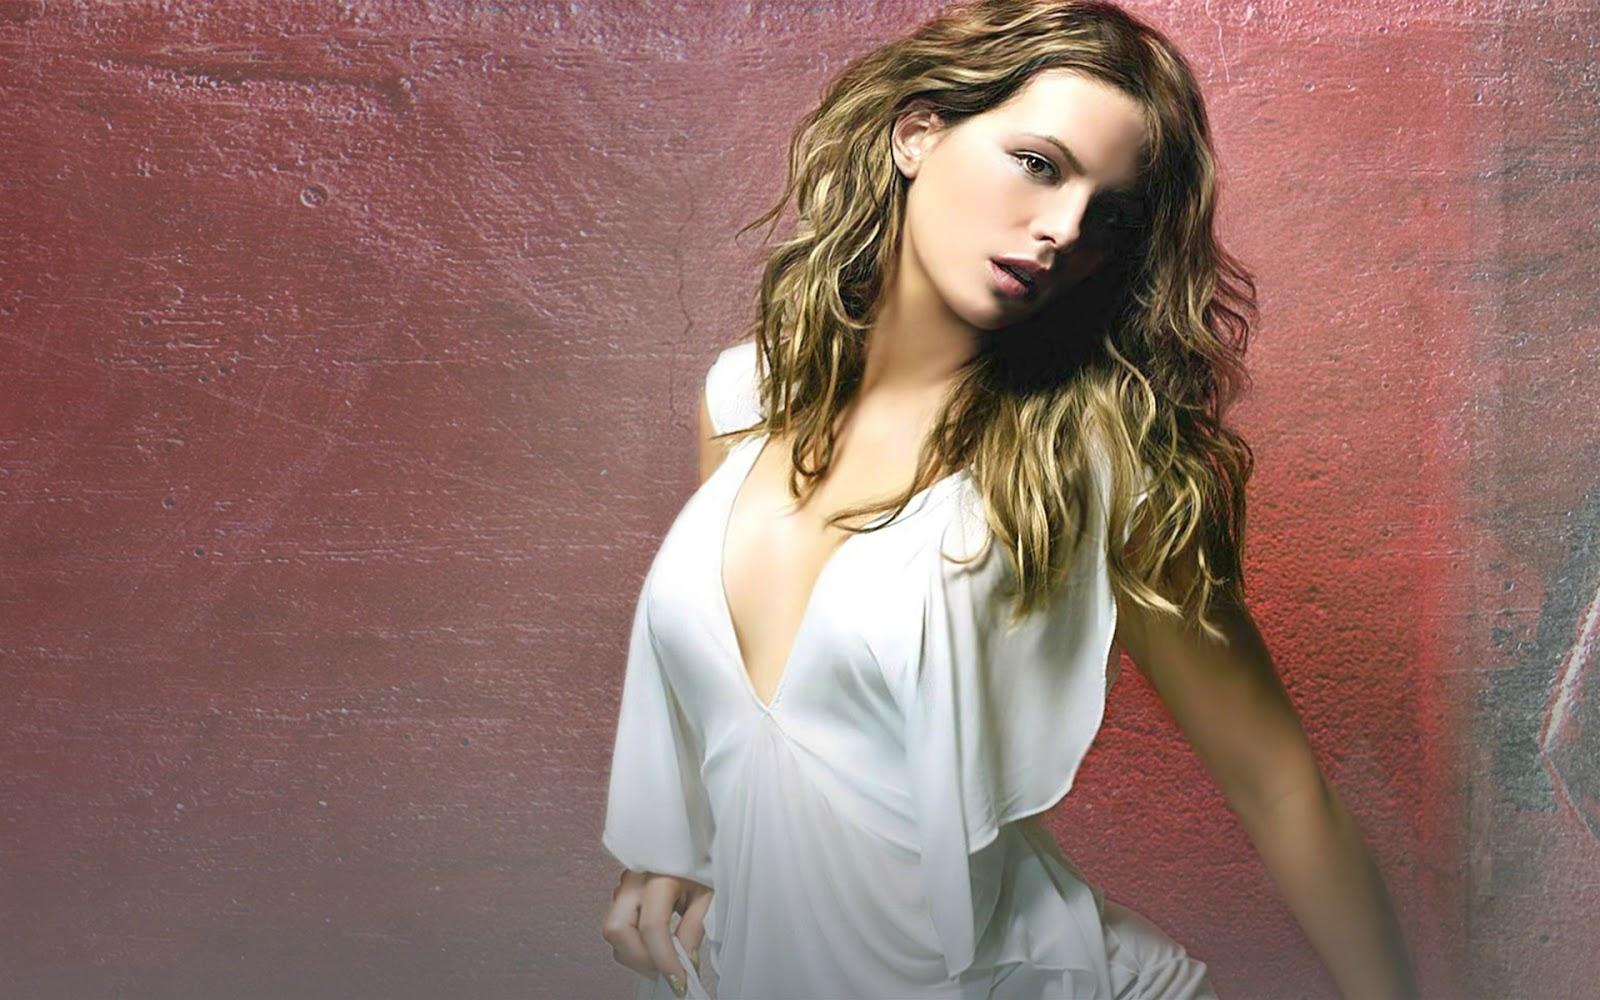 http://4.bp.blogspot.com/-hsm1PdPGinY/ULB5T_vORsI/AAAAAAAAAic/f5v4AQ2U72k/s1600/Kate+Beckinsale+(11).jpg